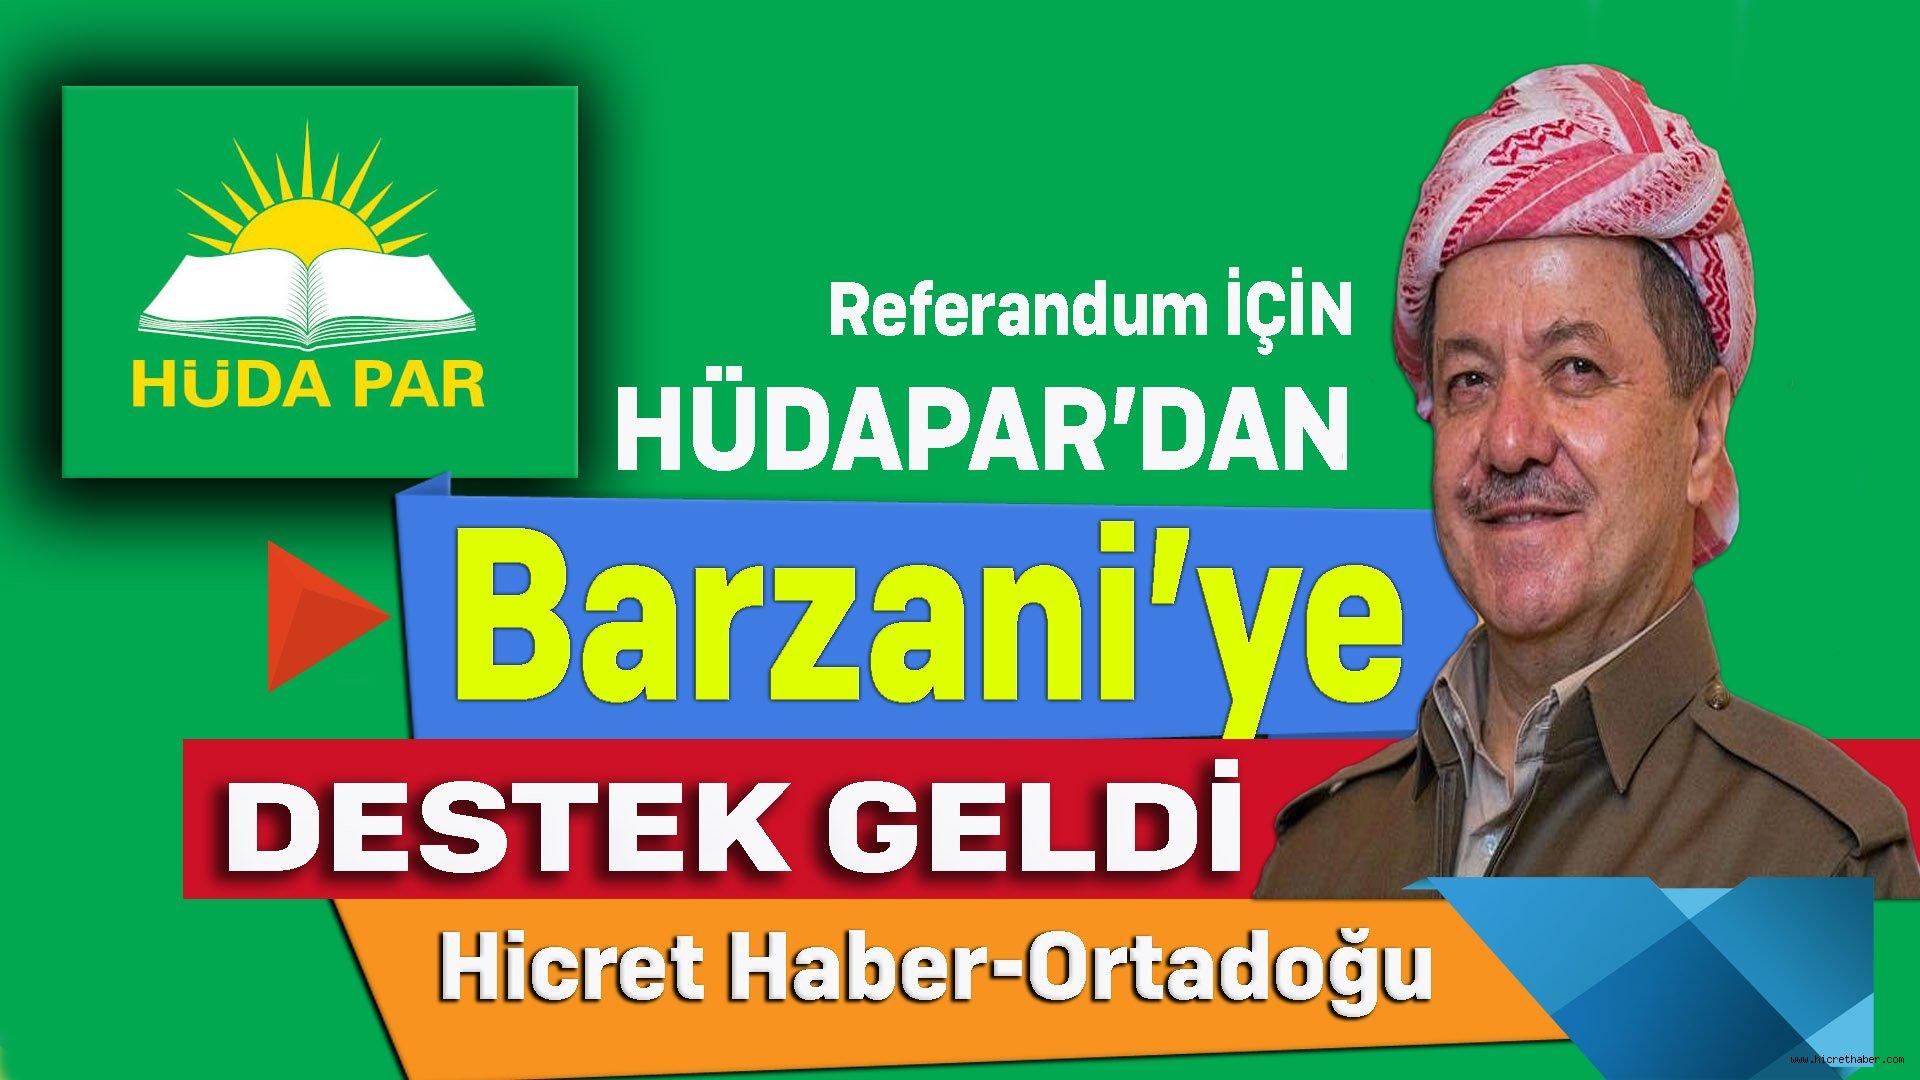 Barzani'ye Referandum Desteği